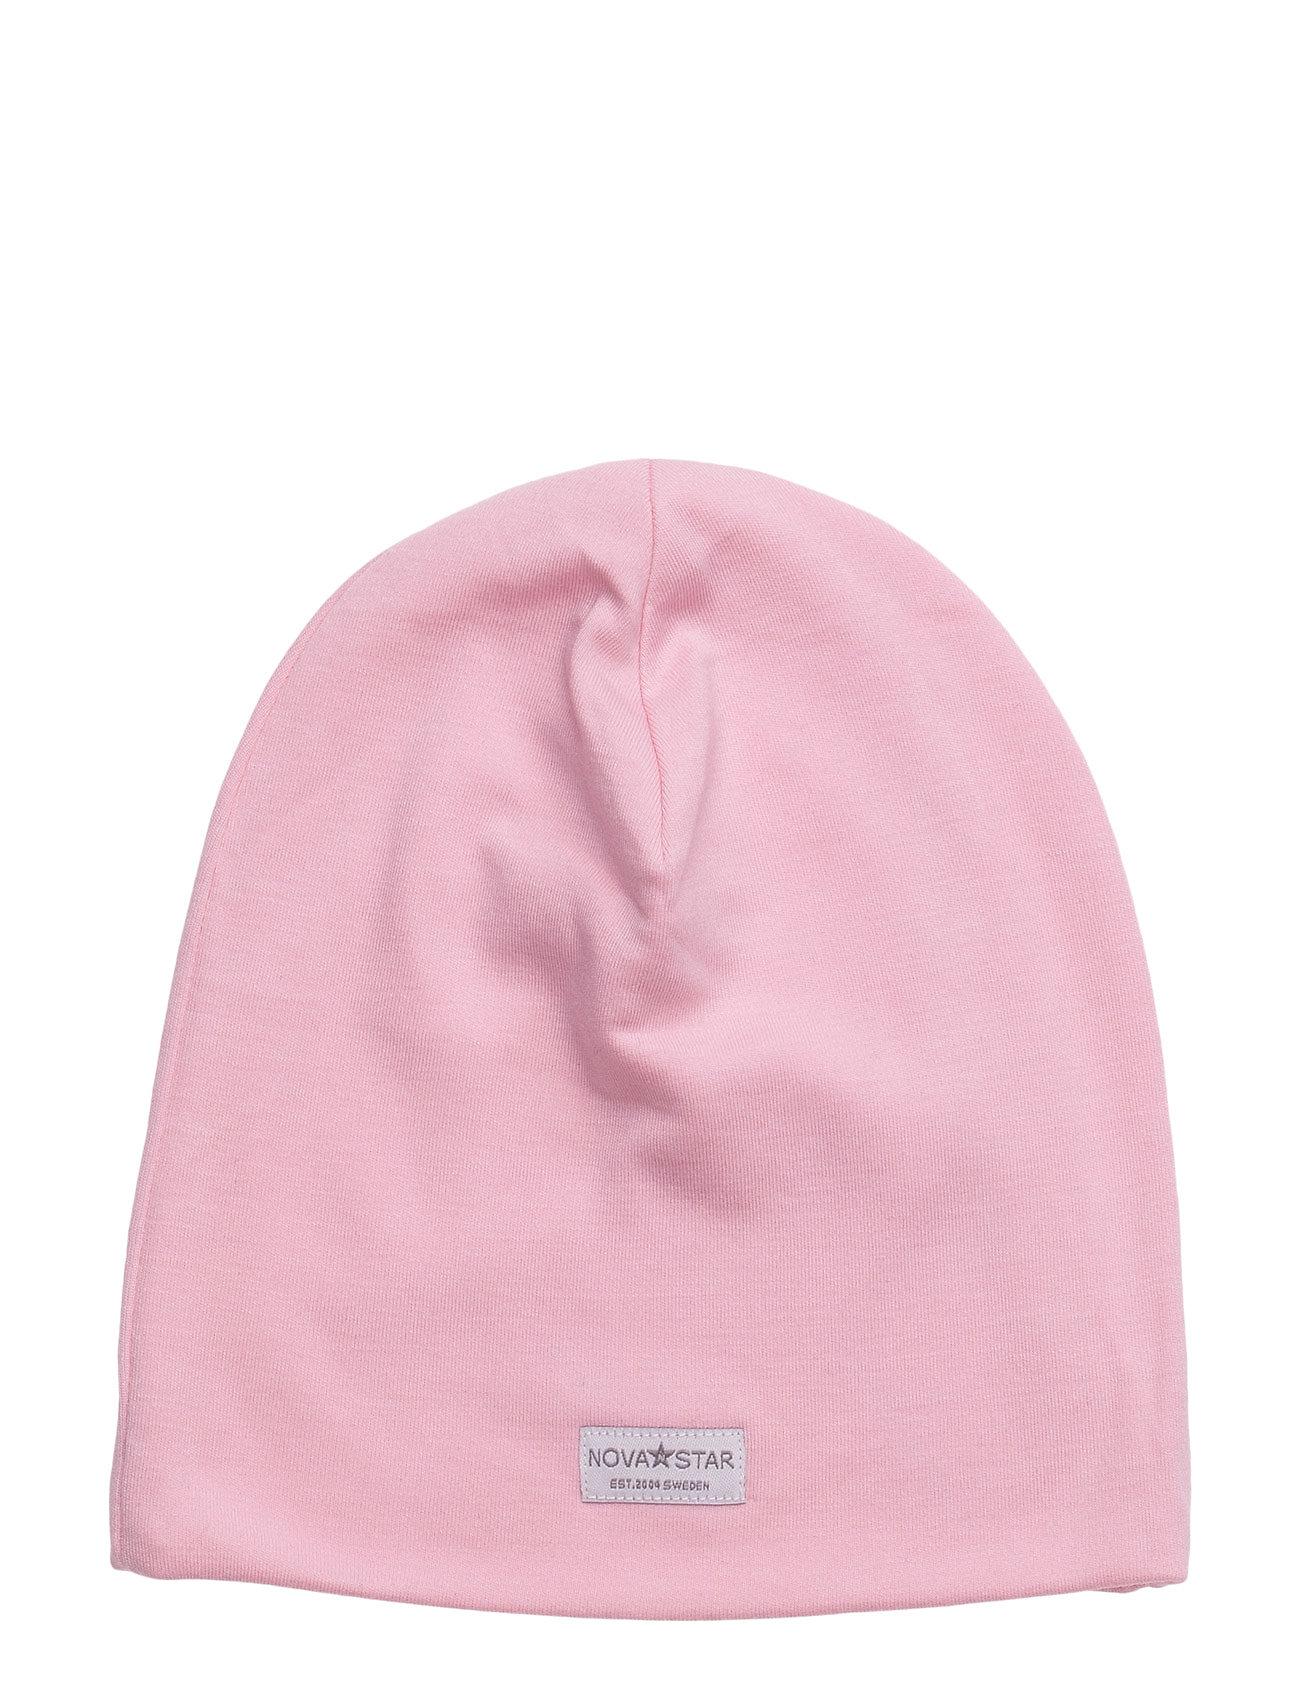 Pink Baby Beanie NOVA STAR Hatte & Caps til Børn i Lyserød